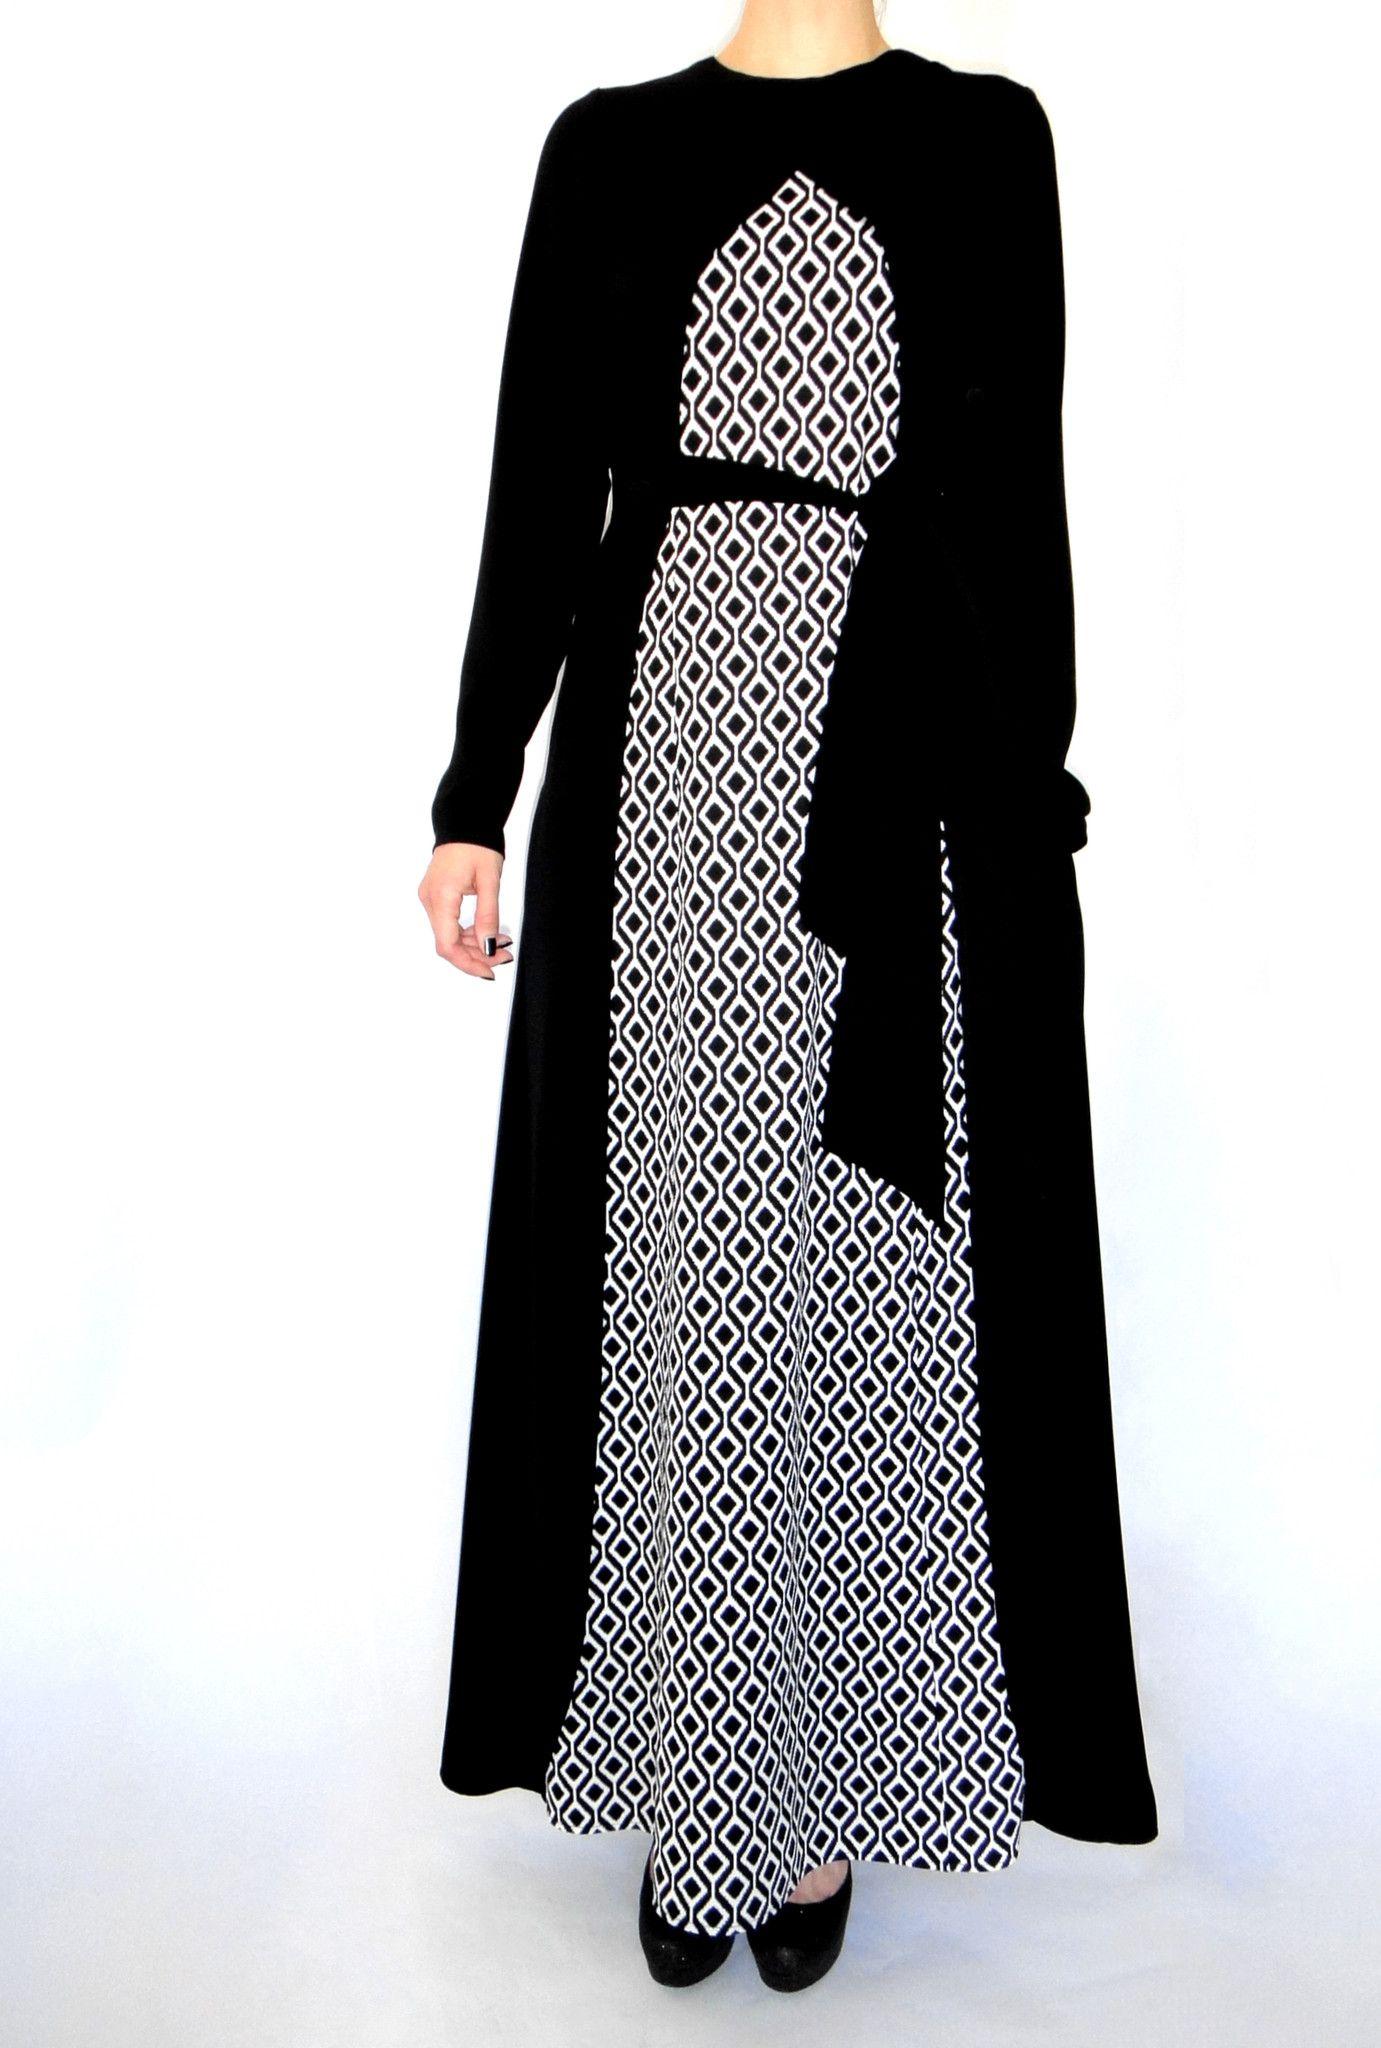 Cape maxi dress fashion pinterest cape maxi dresses and abayas